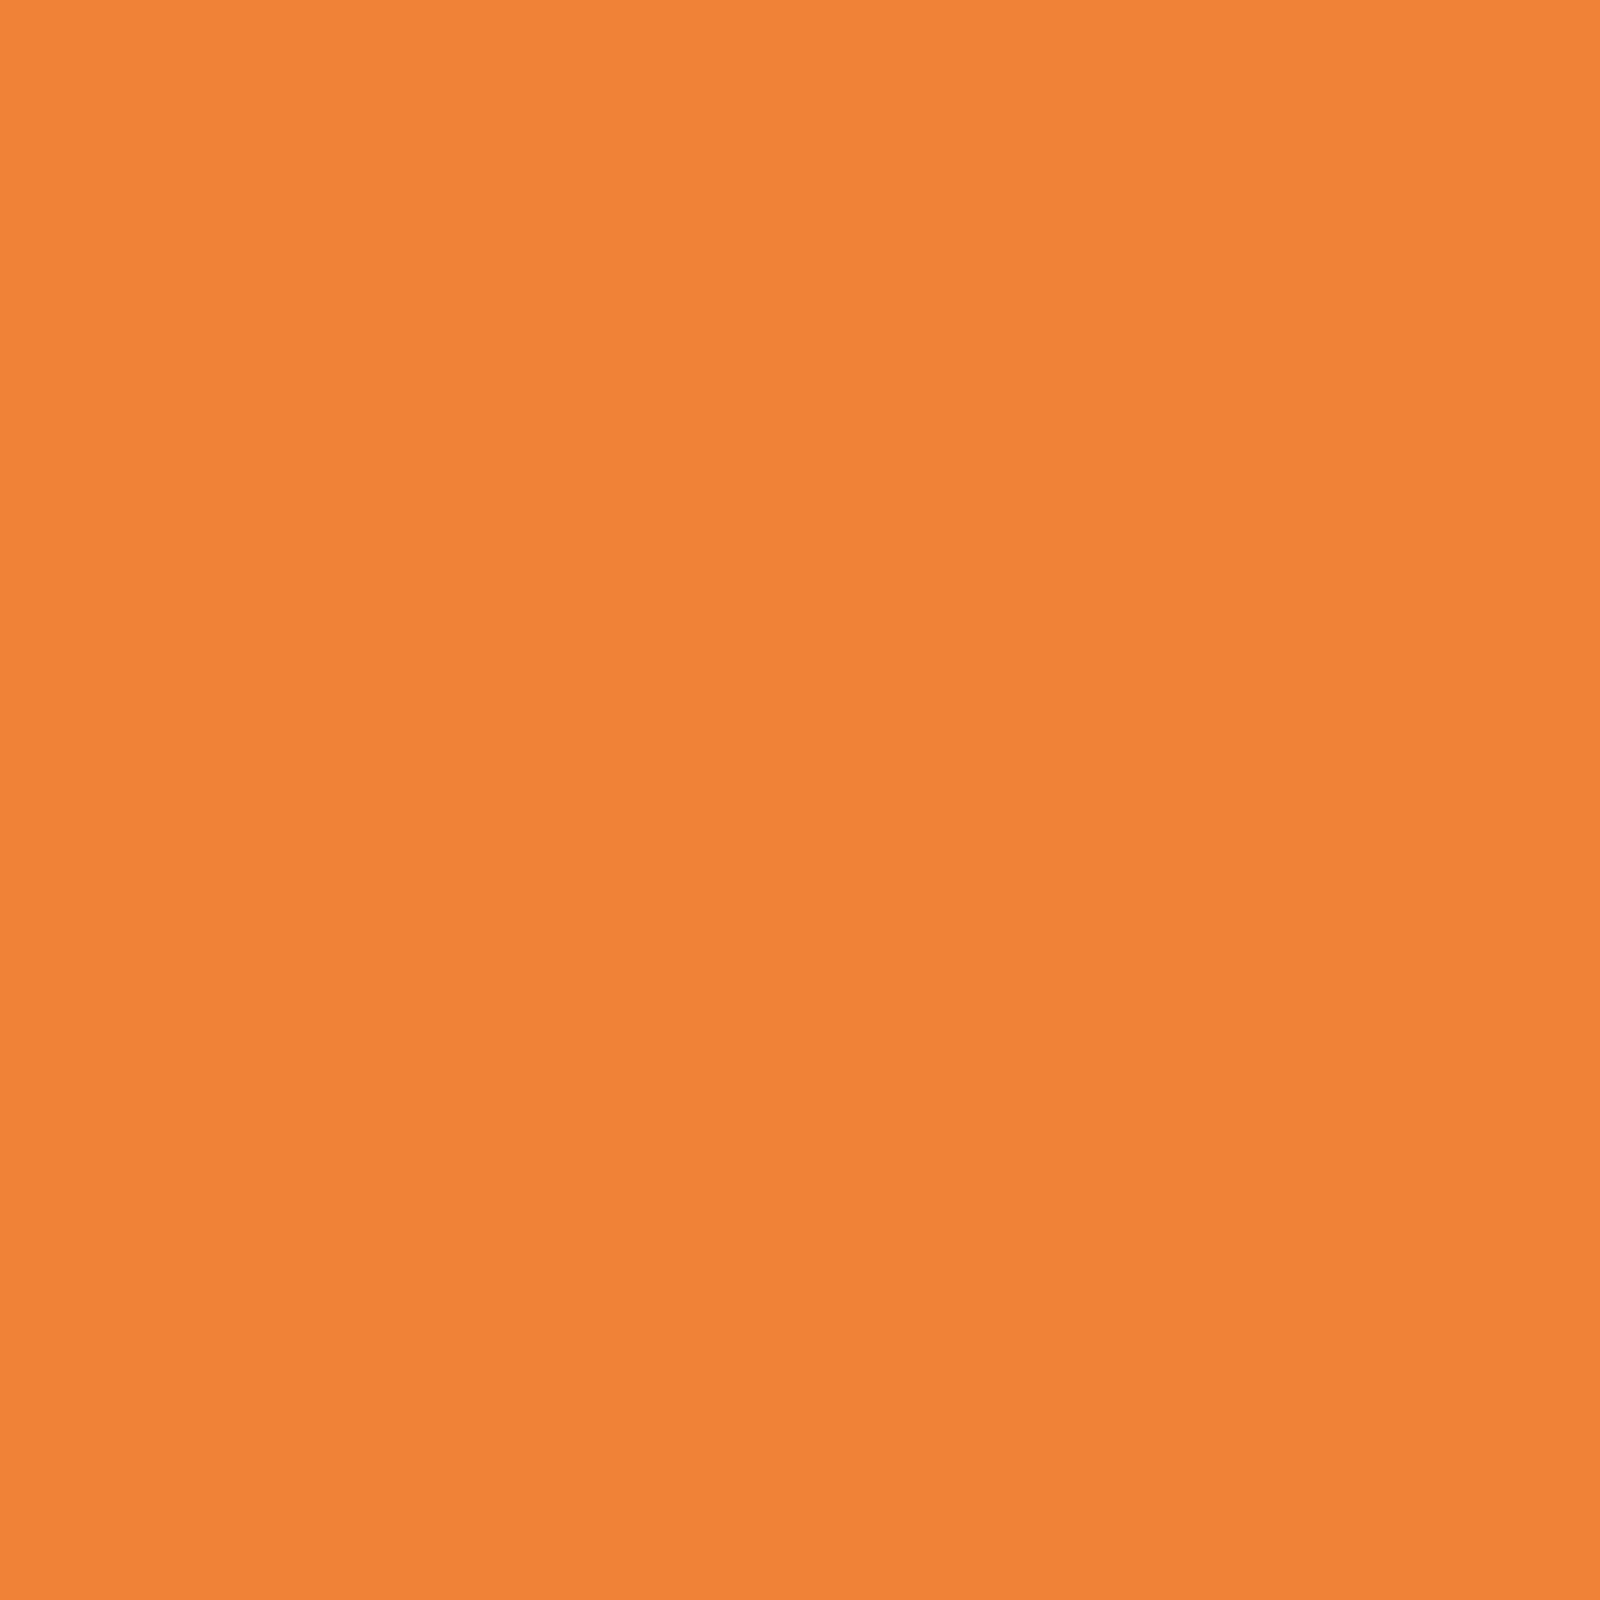 Cosmo Floss - 146 Vivid Orange Pepper